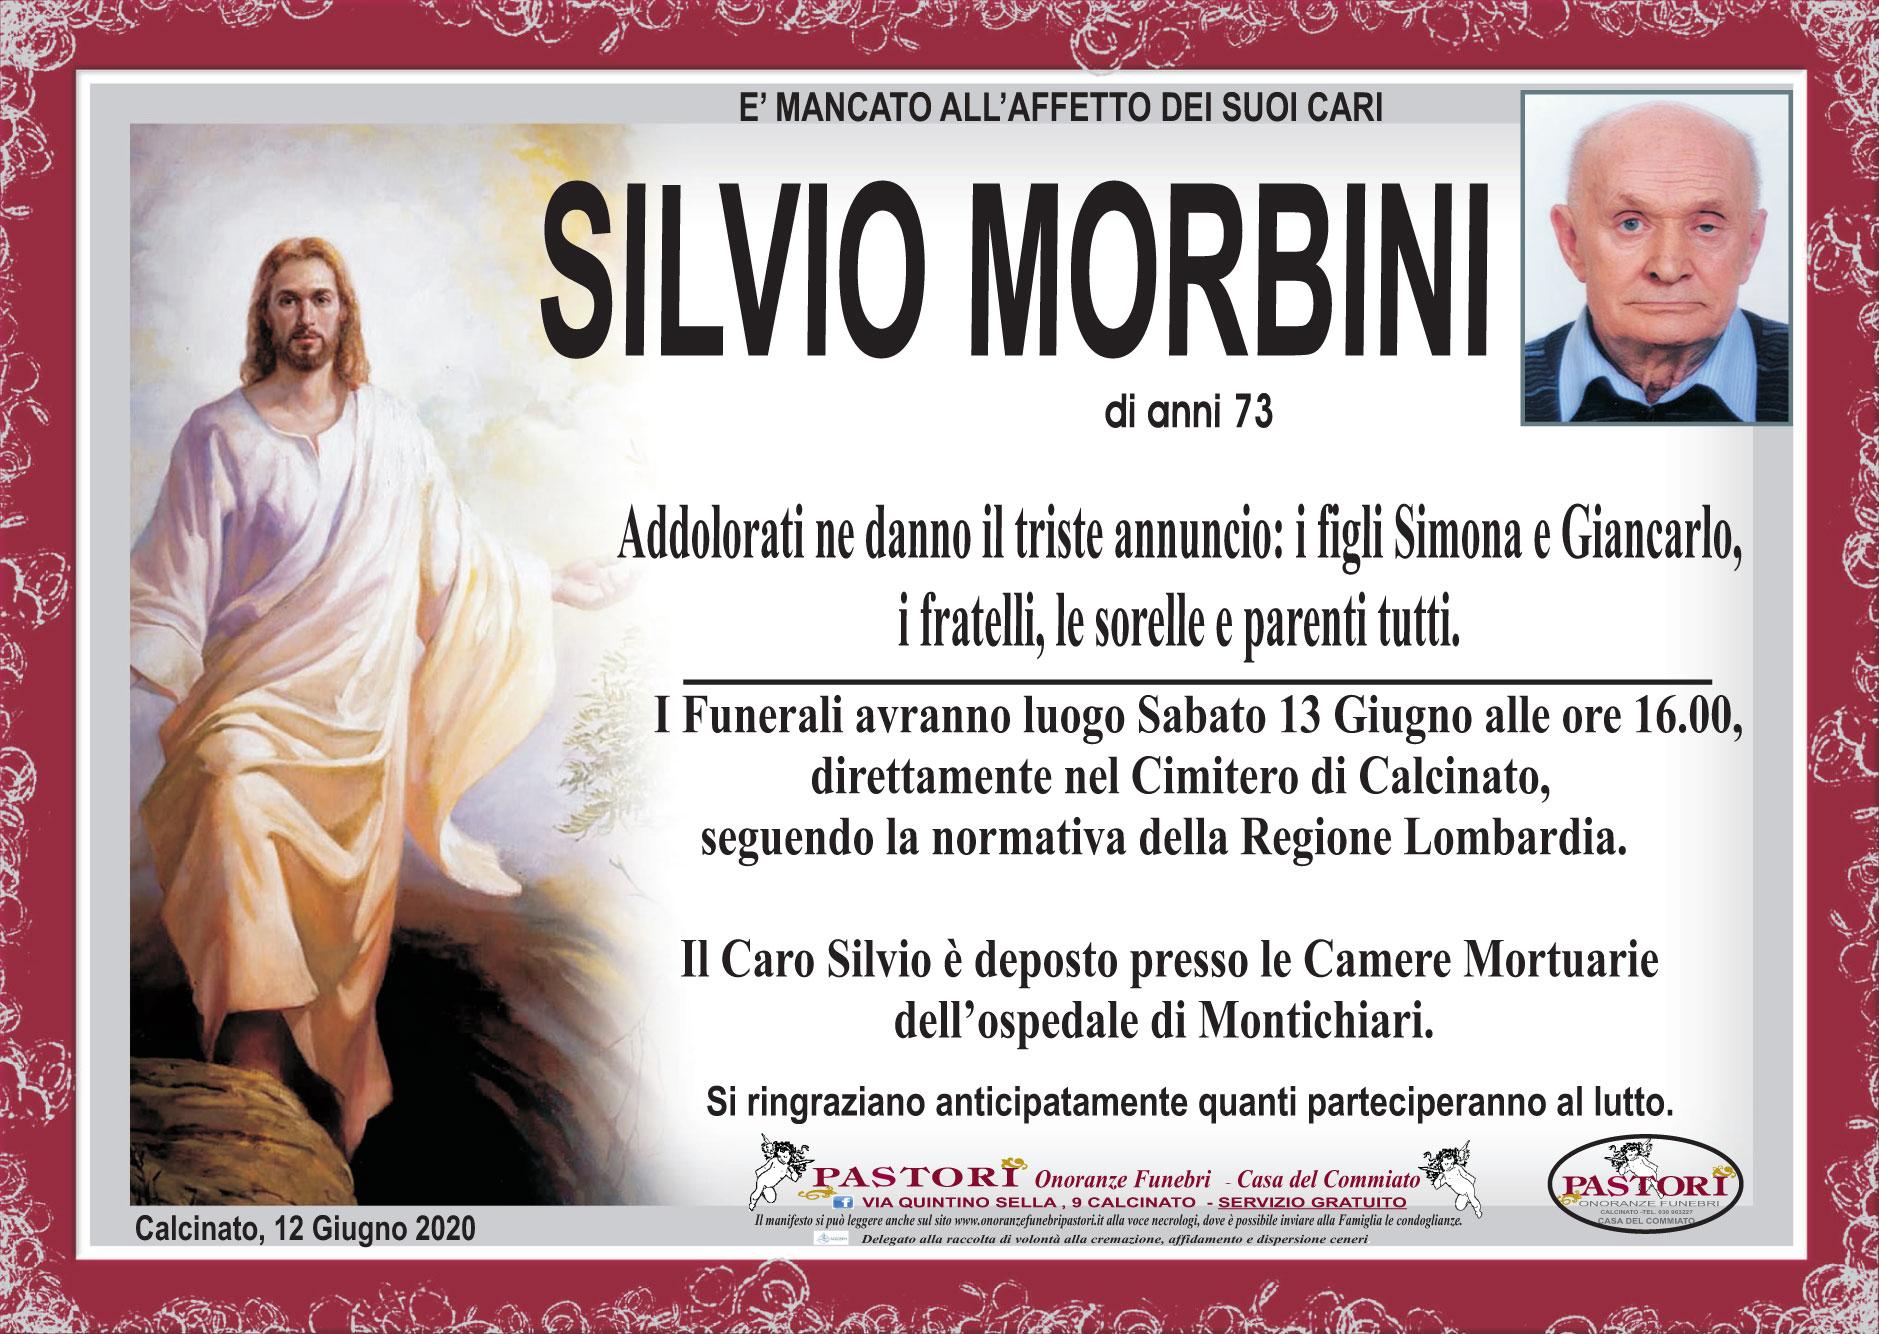 Silvio Morbini